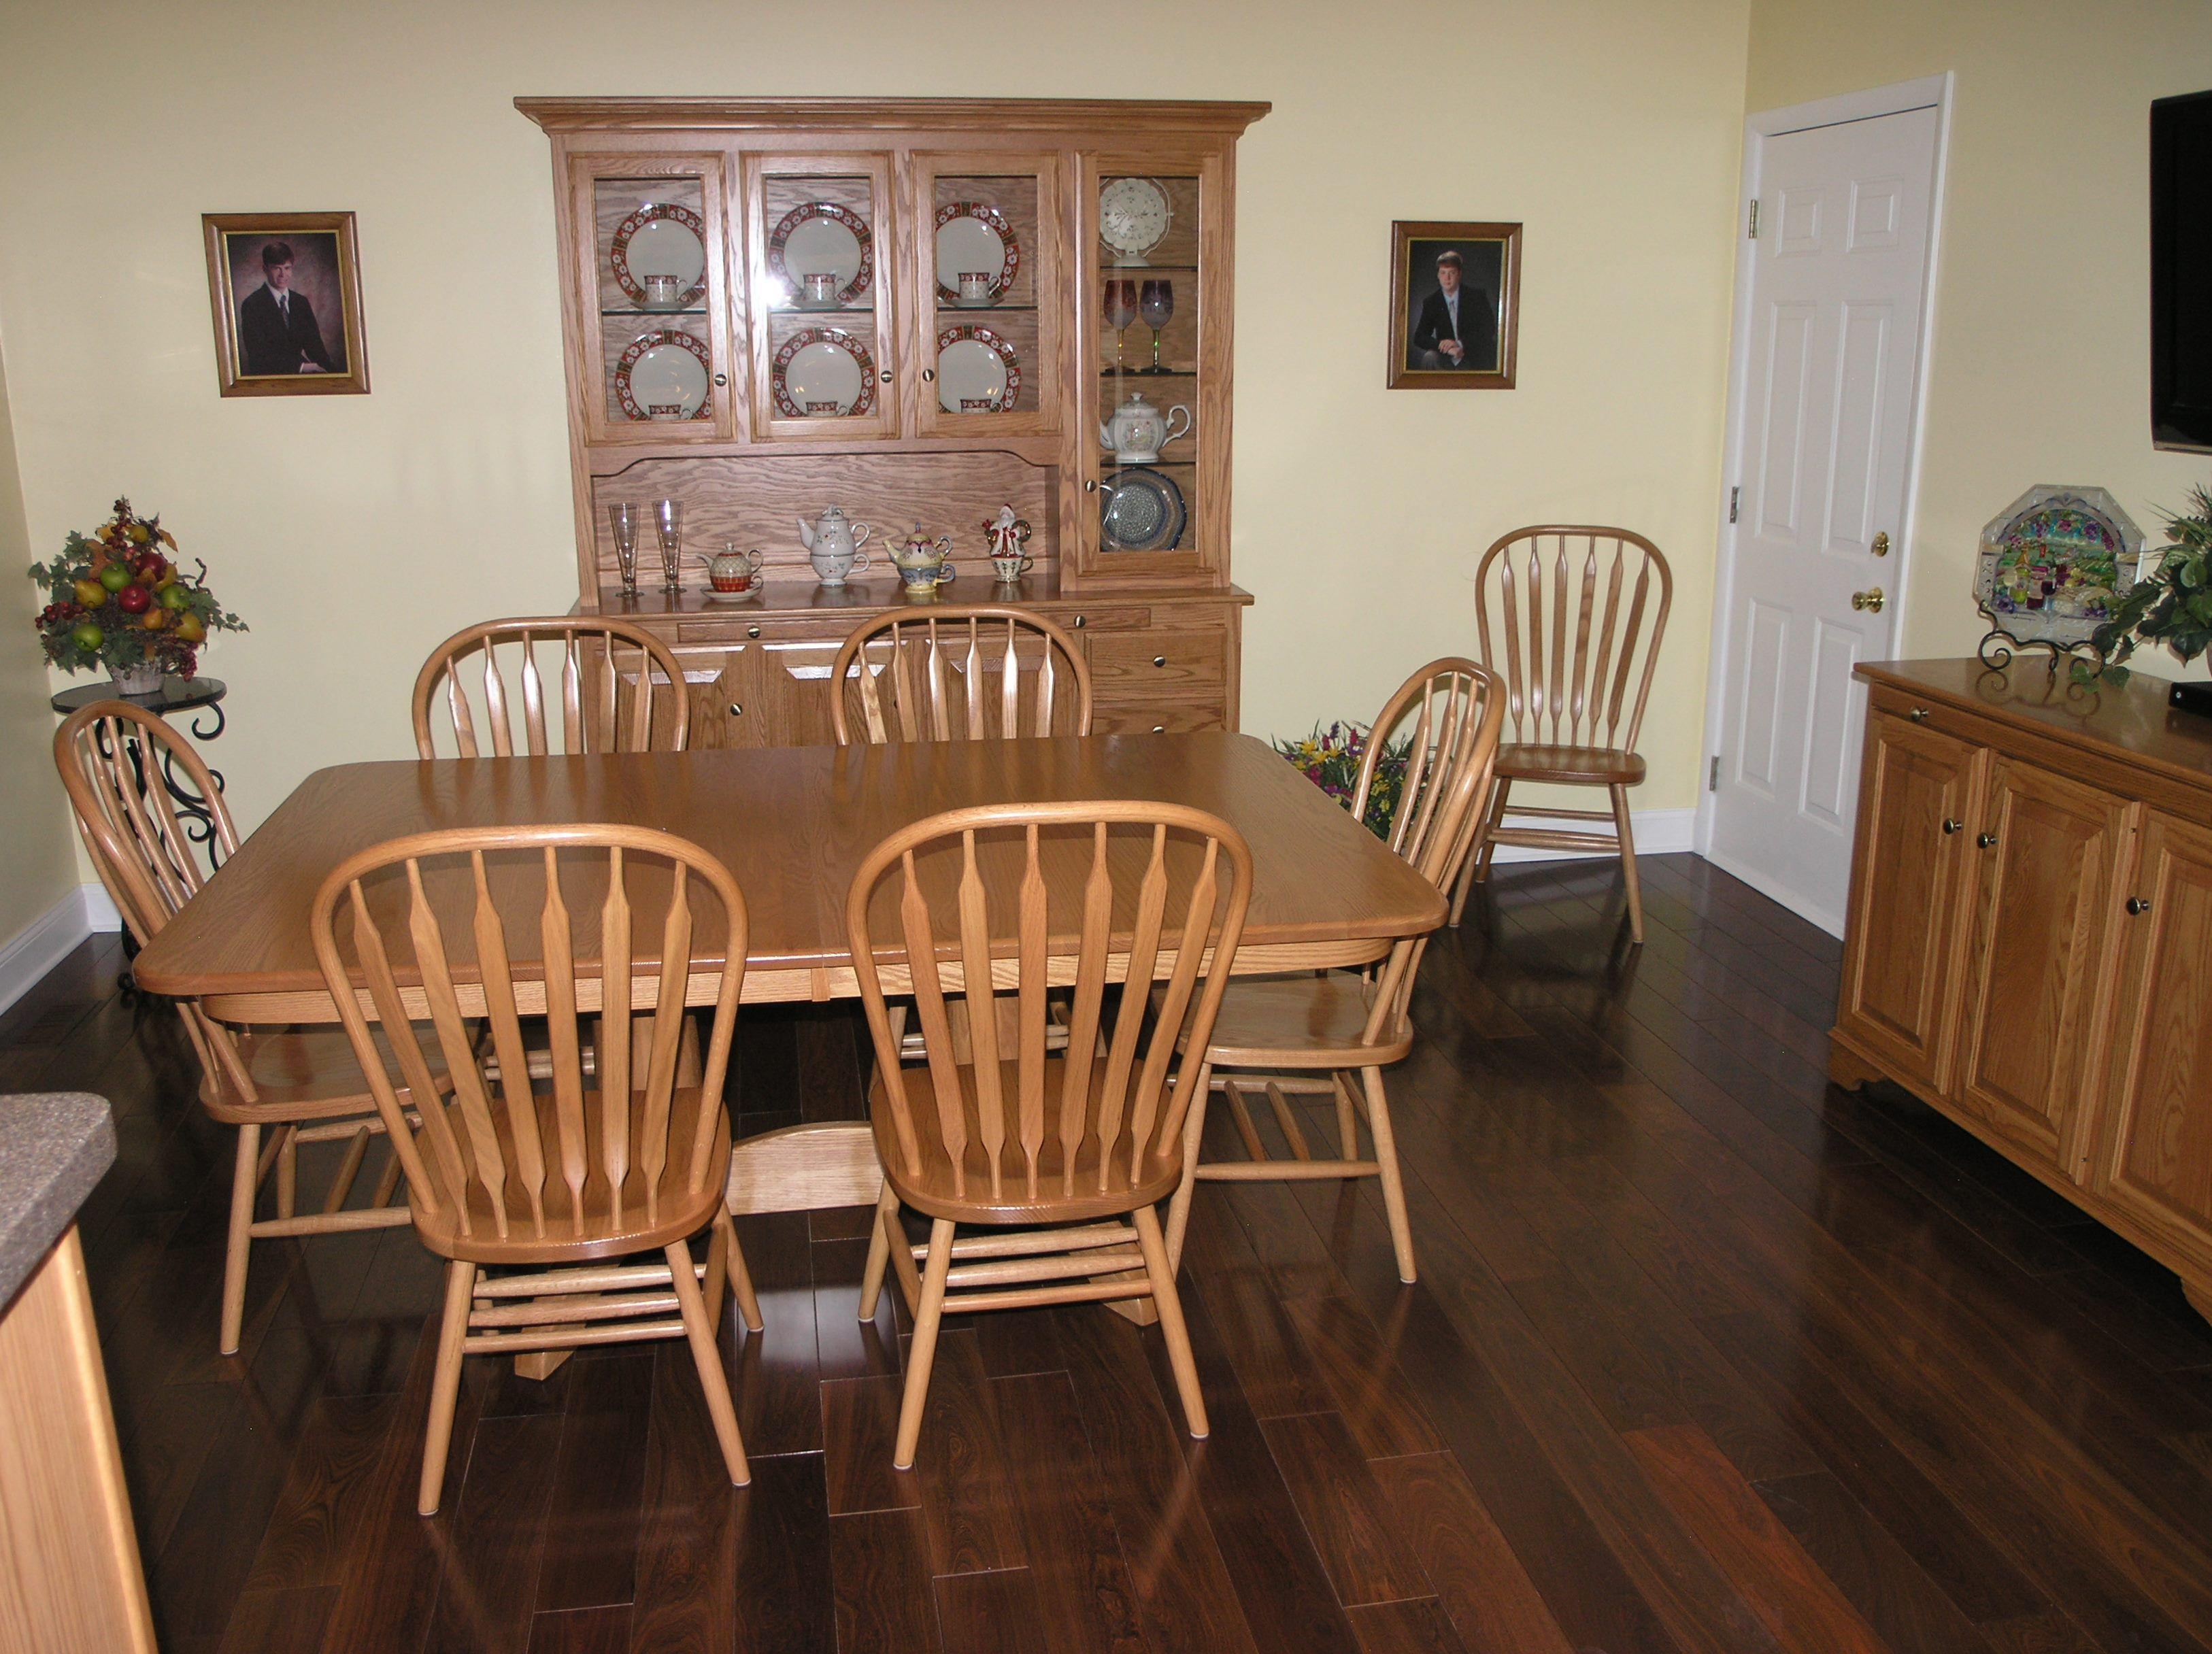 Brazilian ebony hardwood flooring - My New Brazilian Ebony Hardwood Floor And Amish Dining Room Furniture Love It